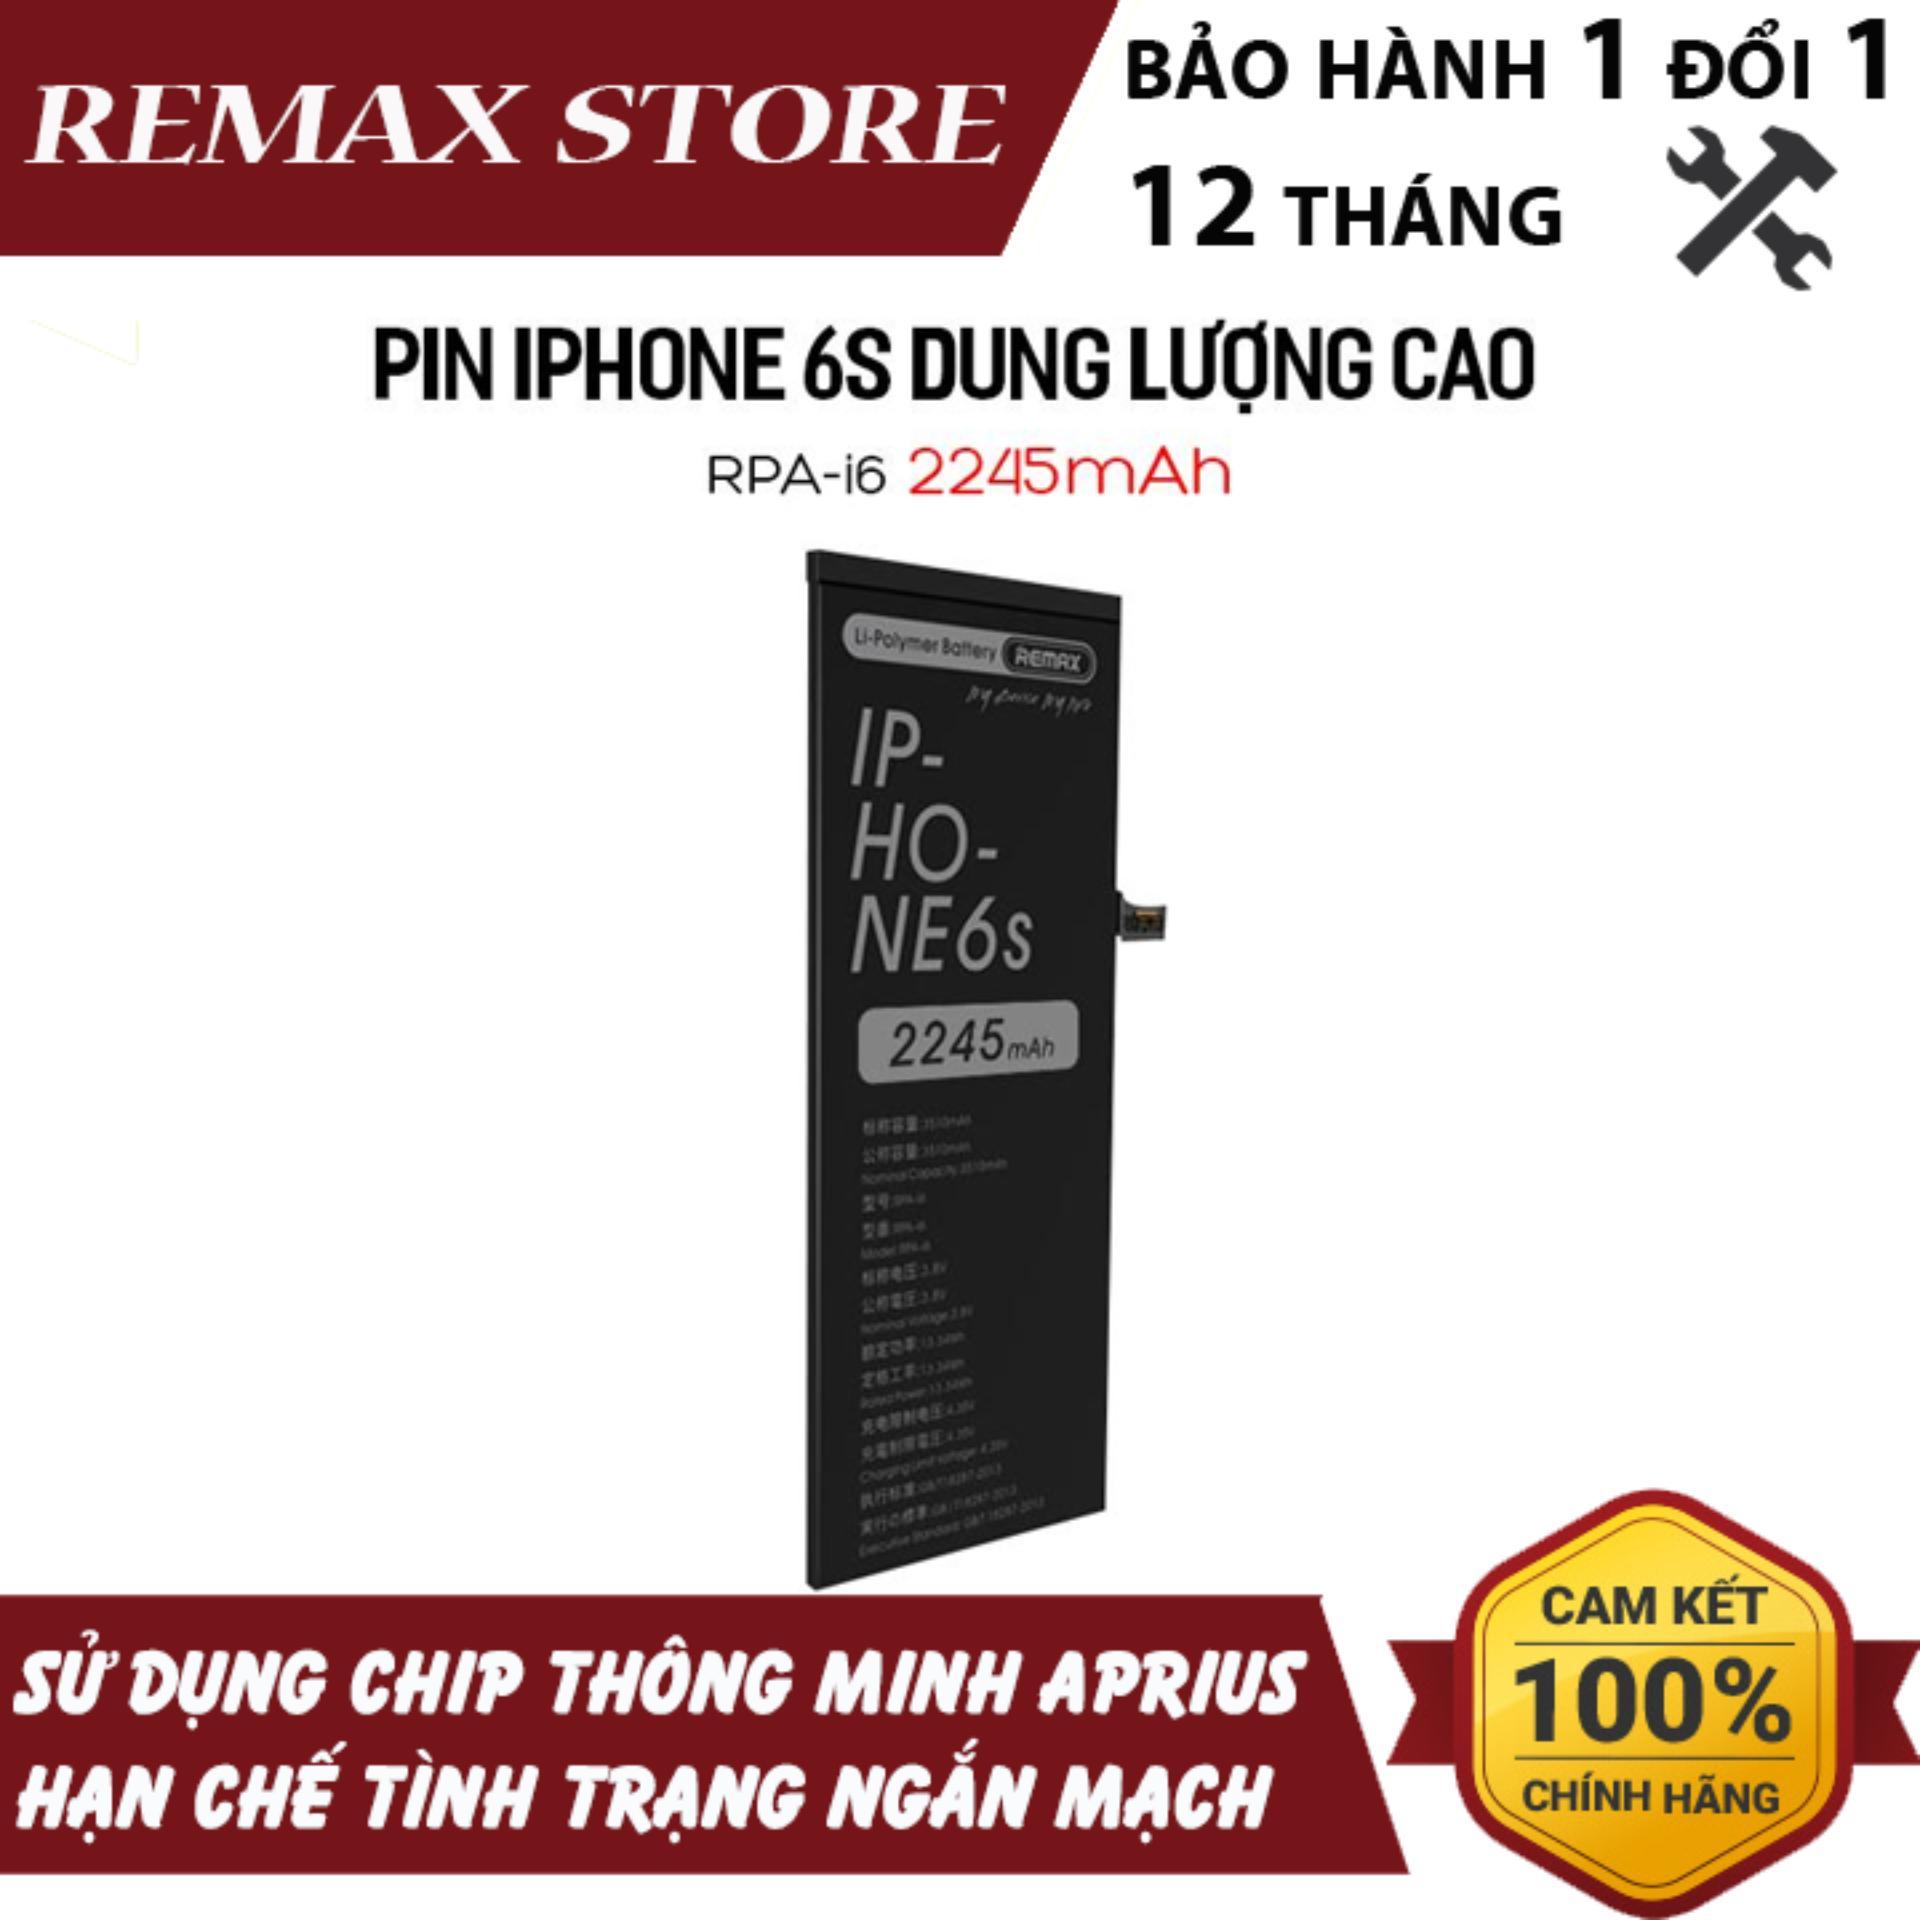 Deal Ưu Đãi Pin IPhone 6S Dung Lượng Cao Remax RPA-i6 2245mAh